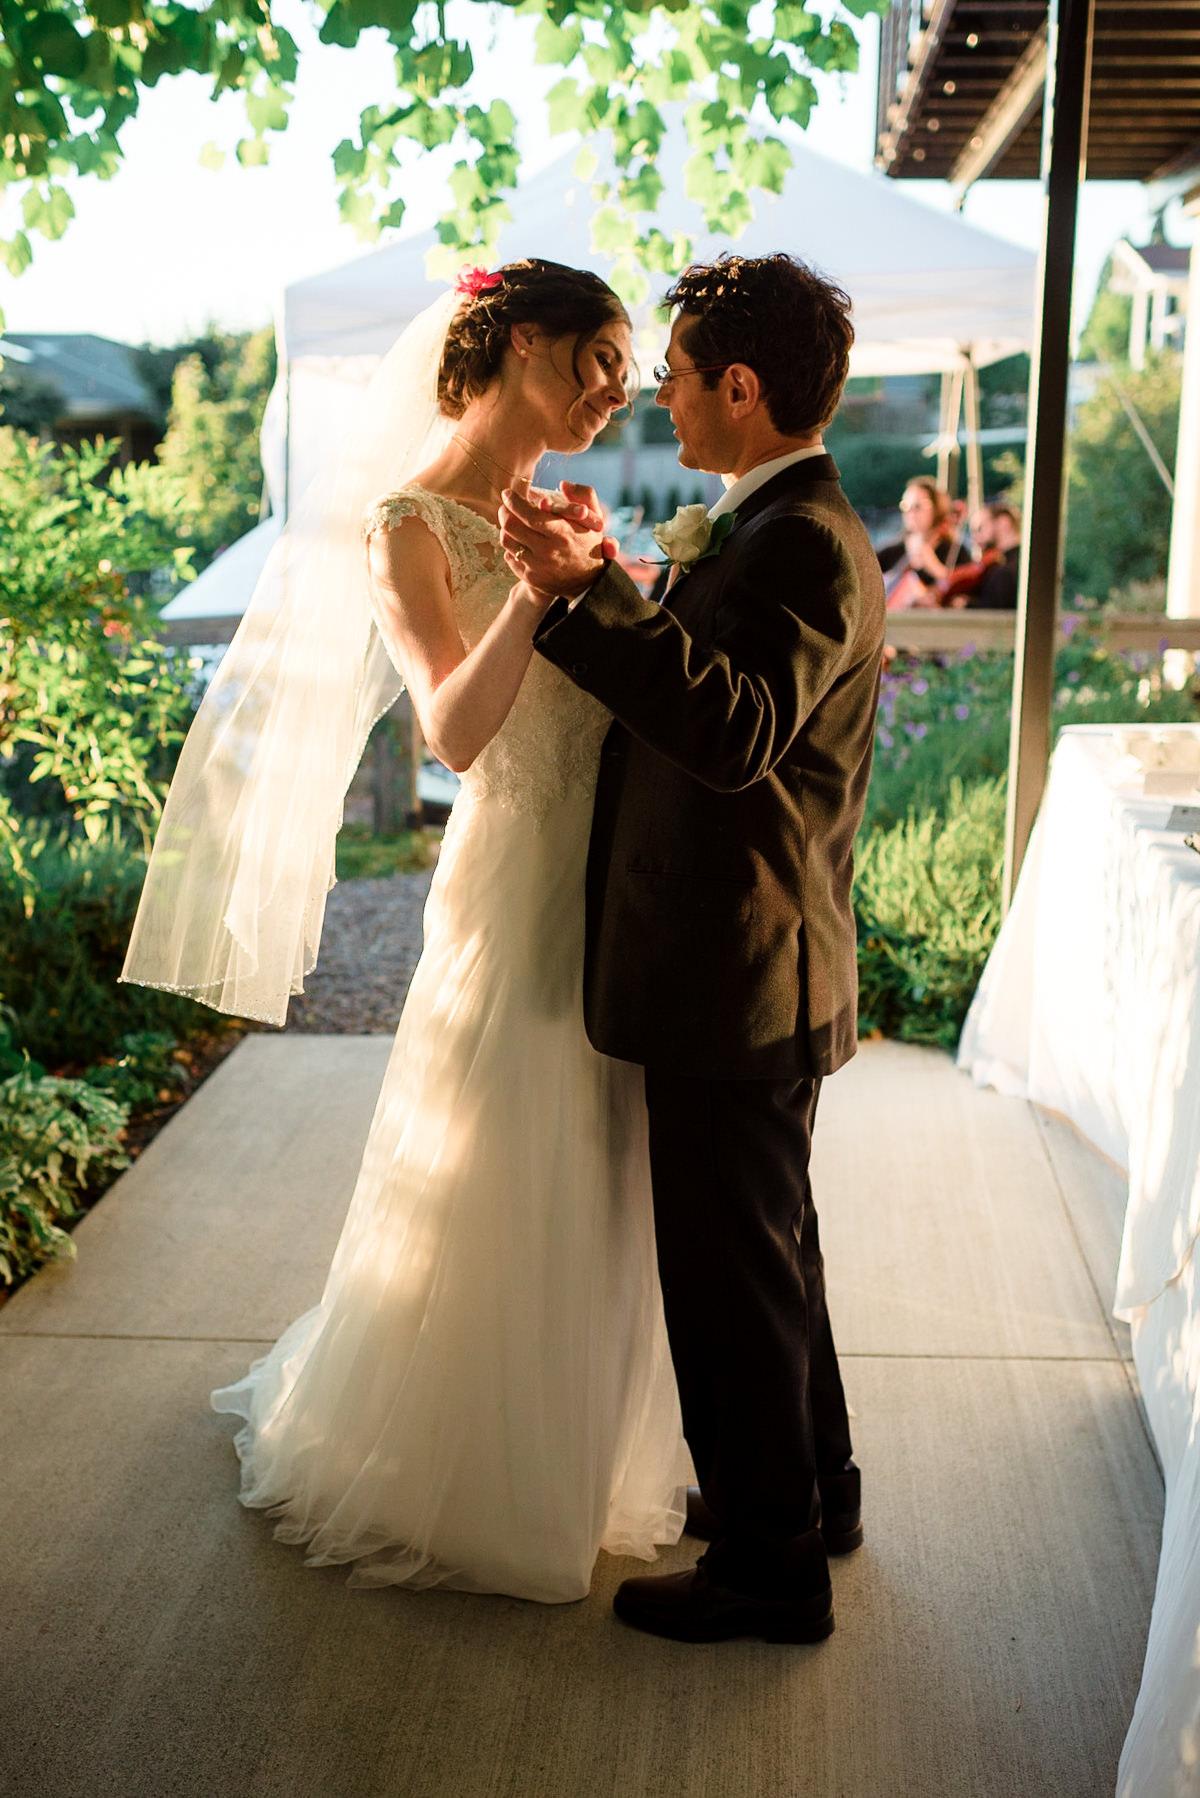 Andrew Tat - Documentary Wedding Photography - Kirkland, Washington - Emily & Cuauh - 42.JPG